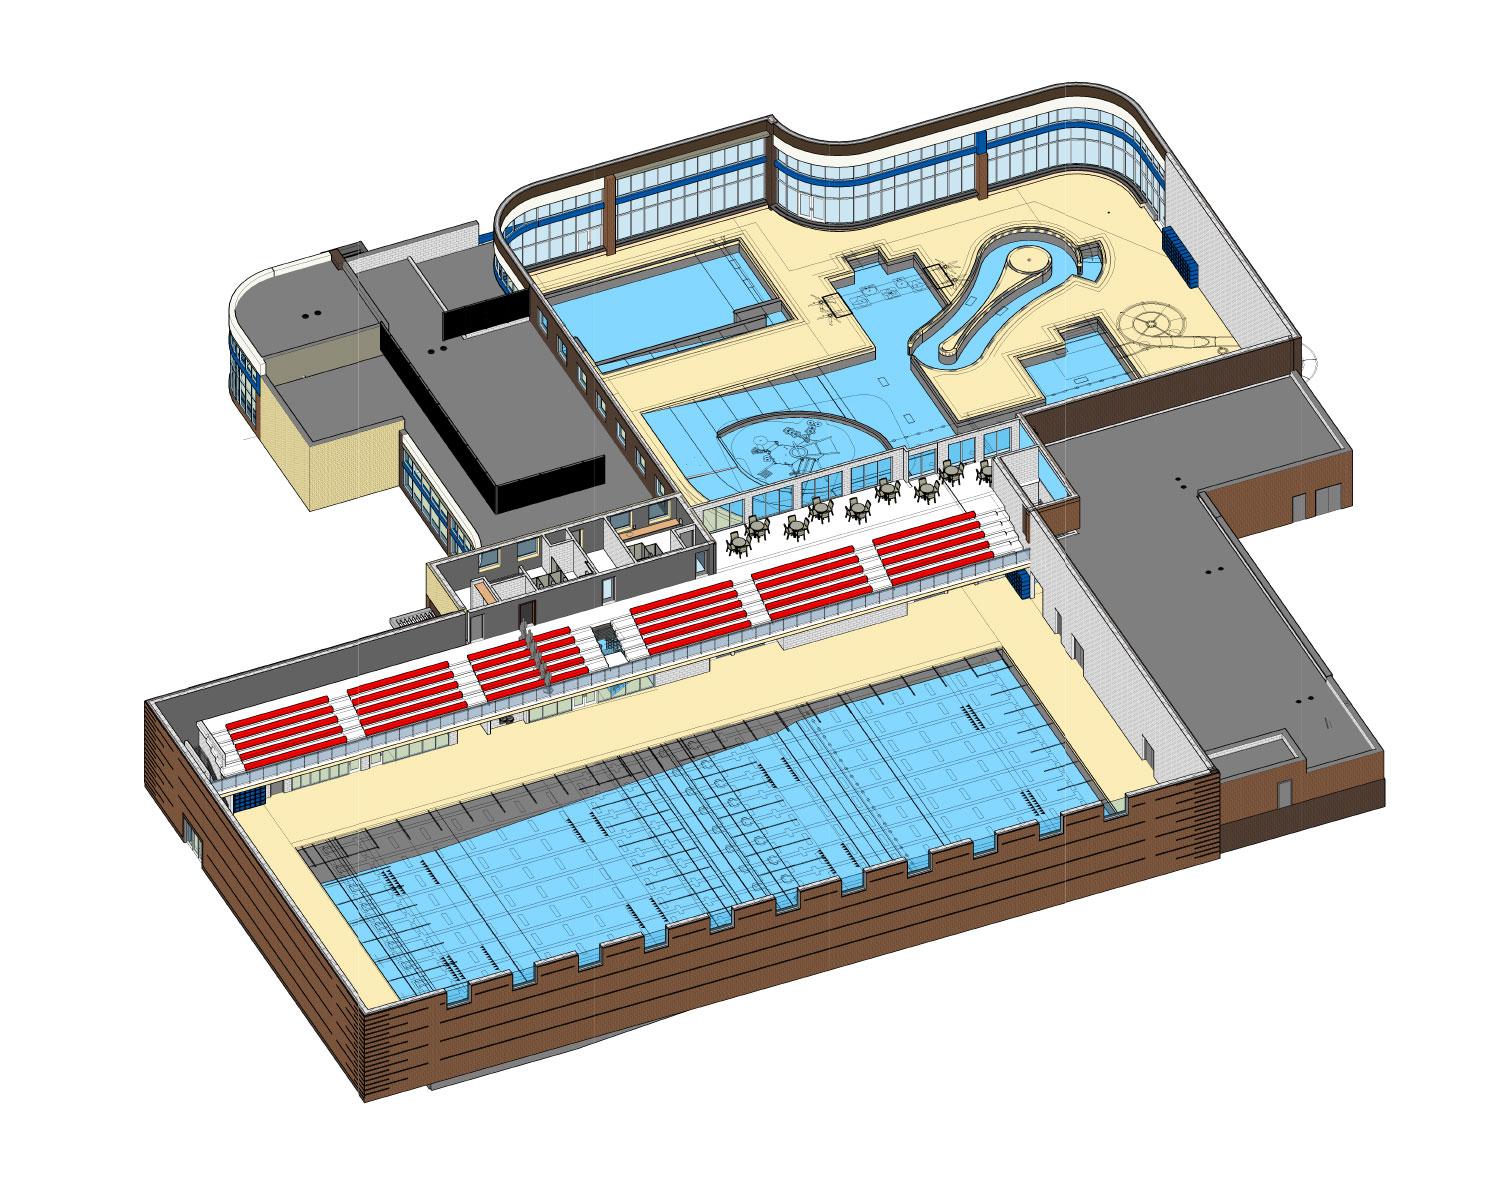 Midco 174 Aquatic Center City Of Sioux Falls